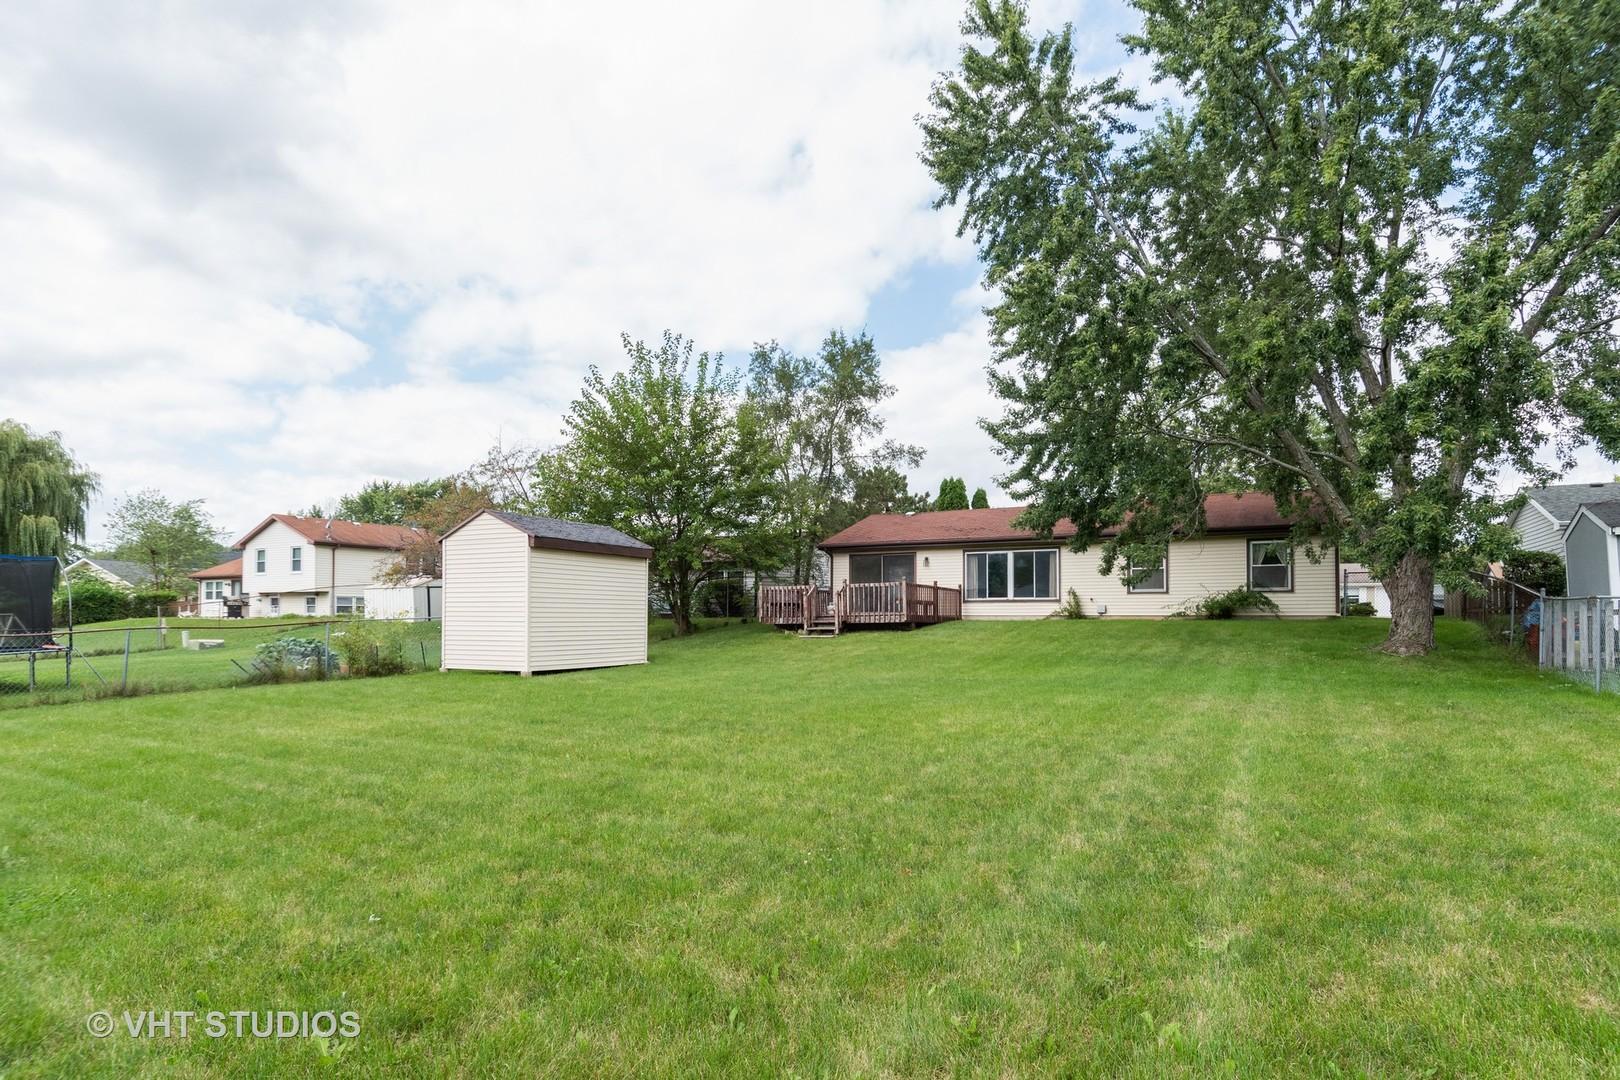 327 Musial, Bolingbrook, Illinois, 60440